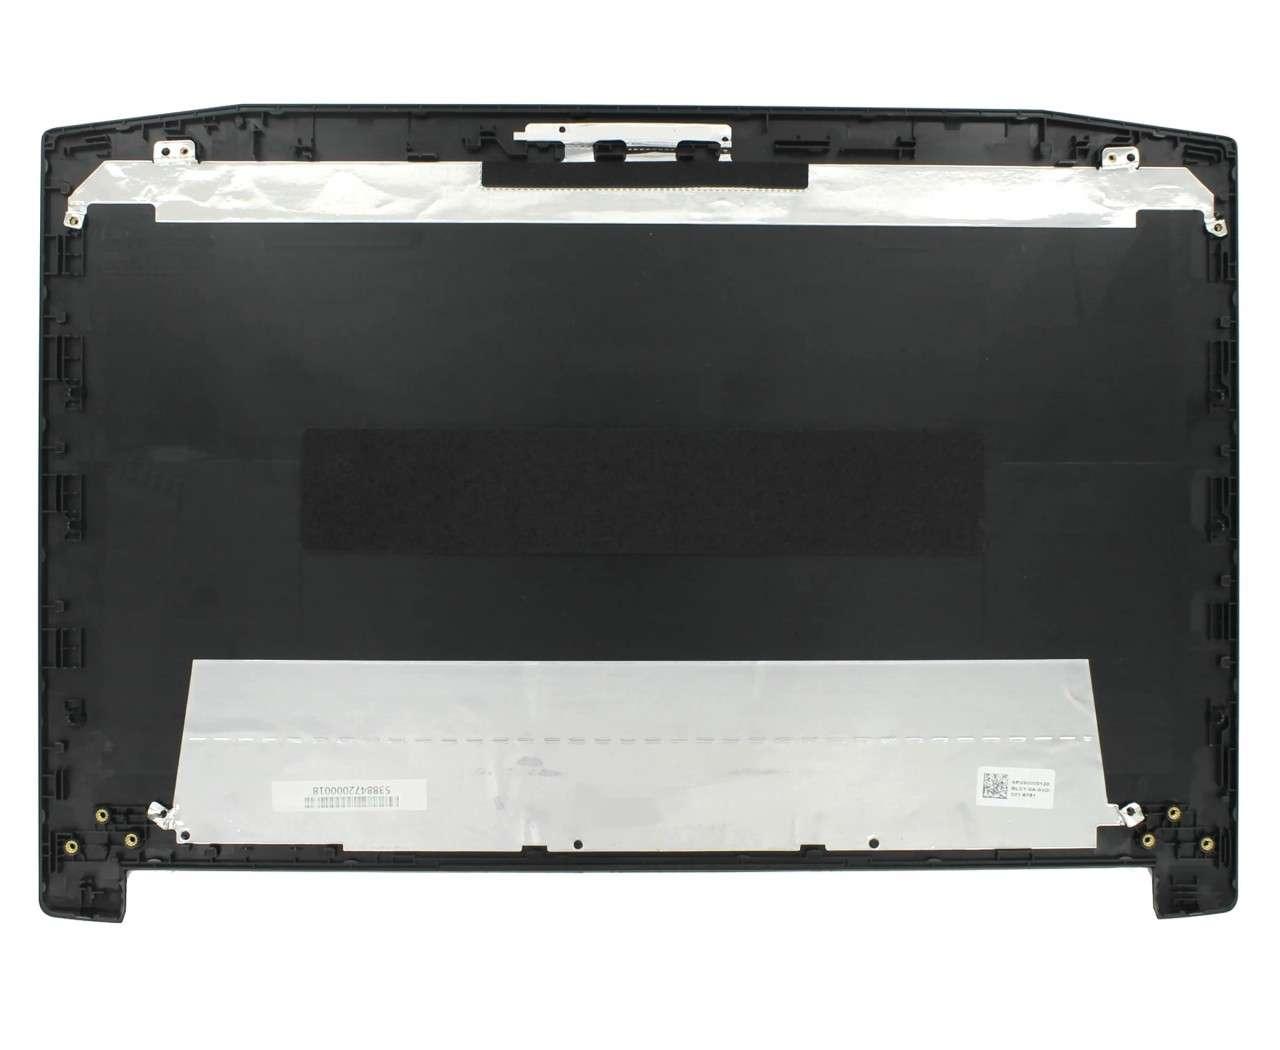 Capac Display BackCover Acer Nitro 5 AN515-31 Carcasa Display imagine powerlaptop.ro 2021